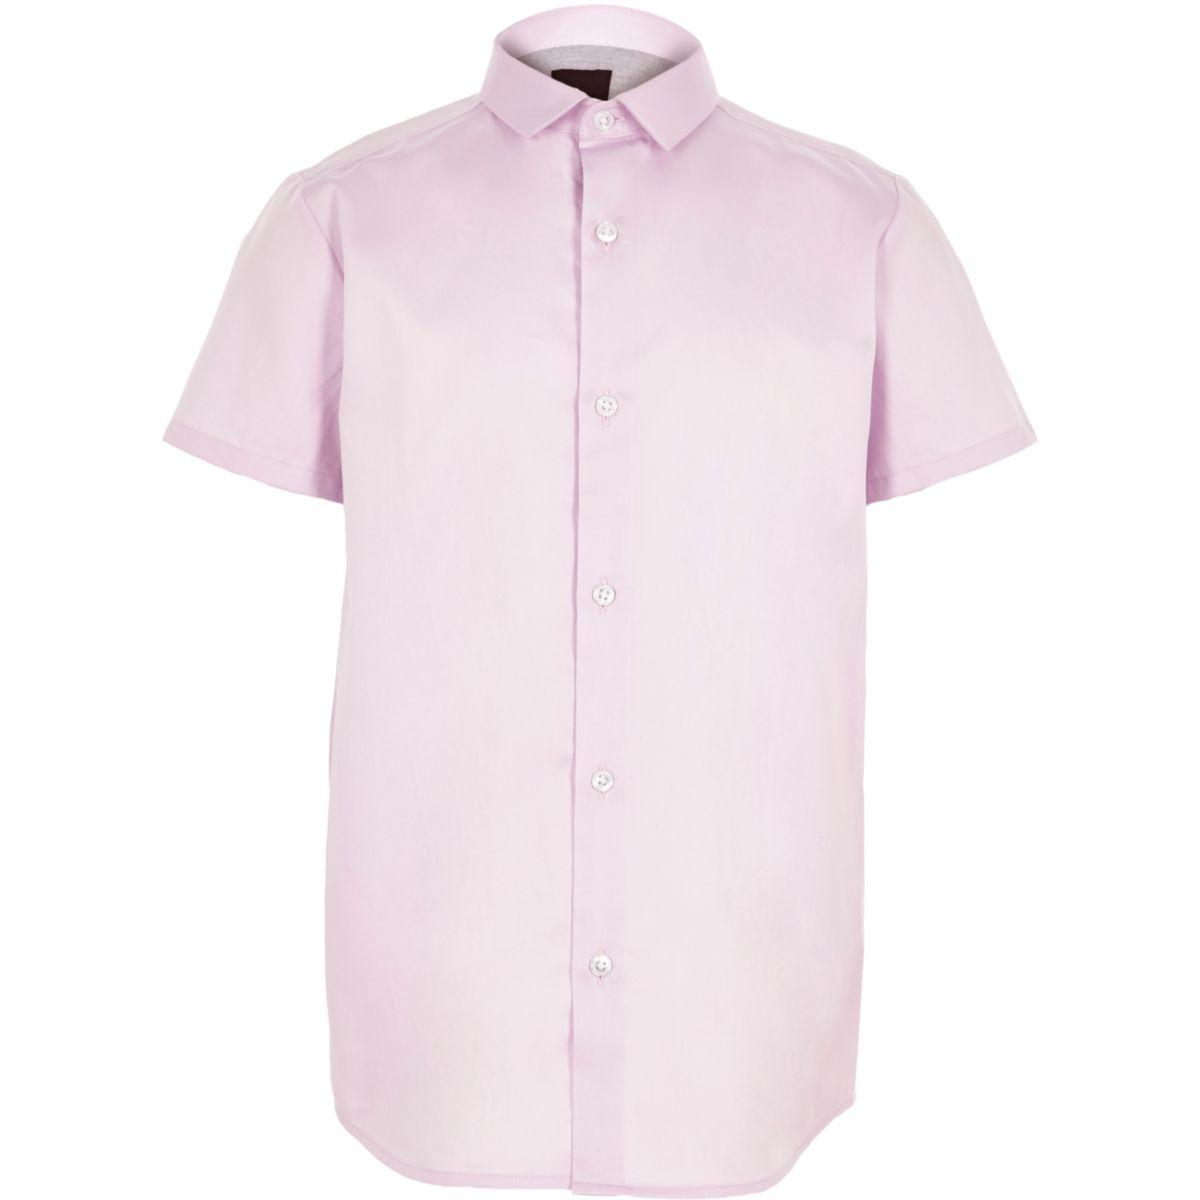 Boys purple short sleeve shirt